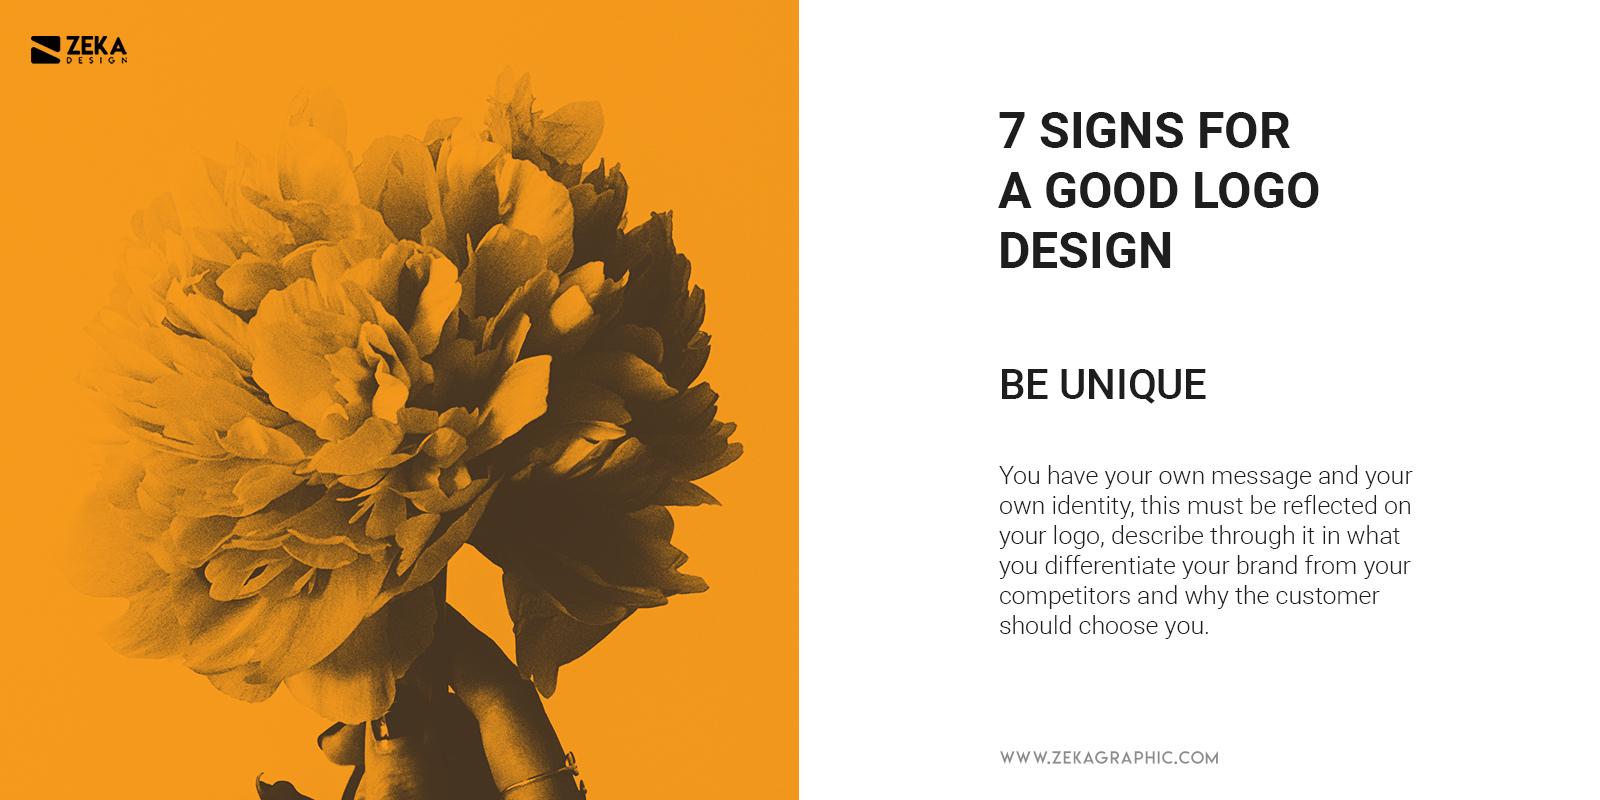 Unique Logo Design Quality What Makes Good Logo Design